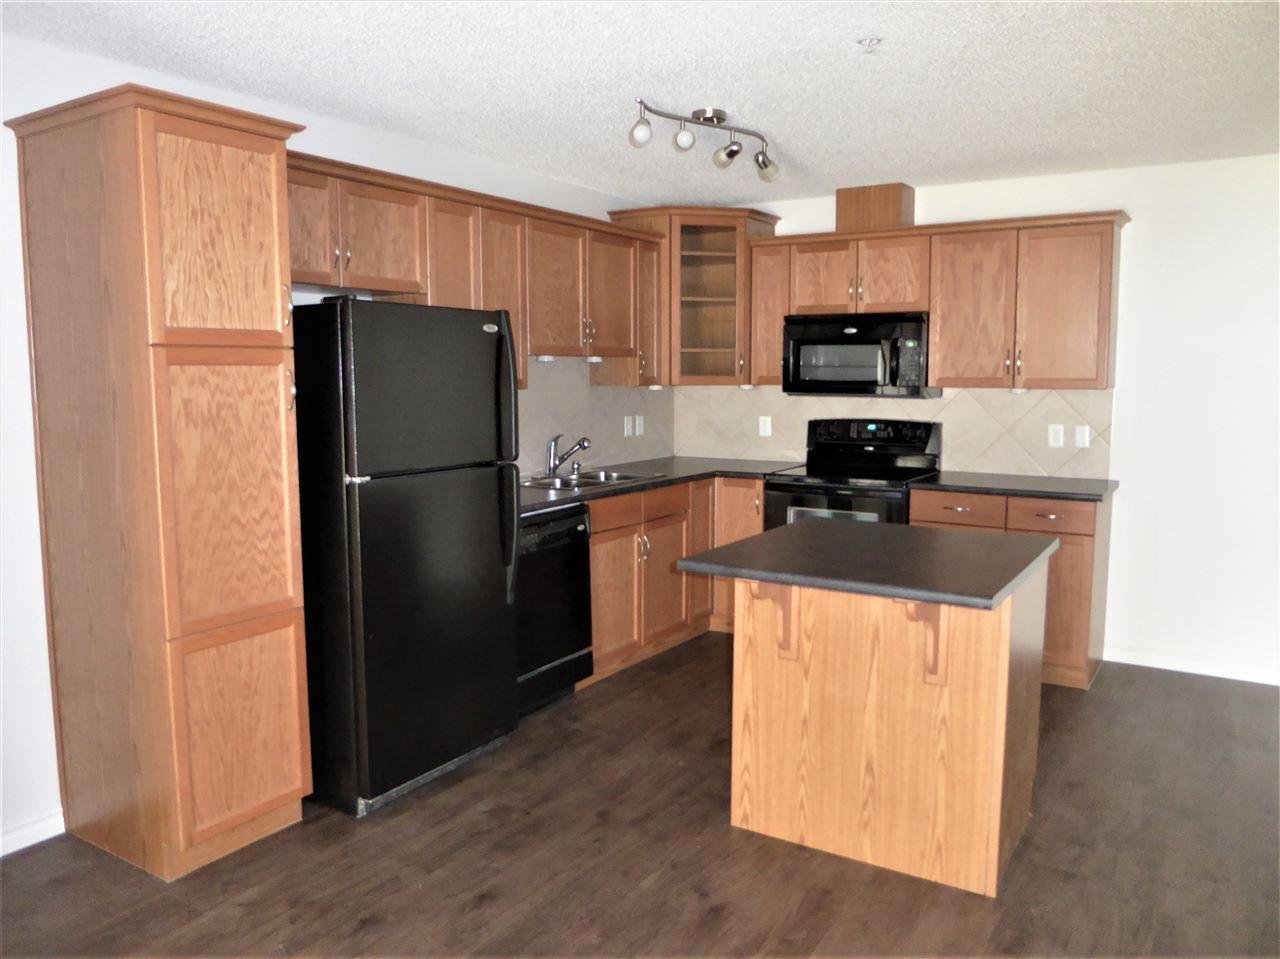 Main Photo: 131 2436 Guardian Road NW in Edmonton: Zone 58 Condo for sale : MLS®# E4210360